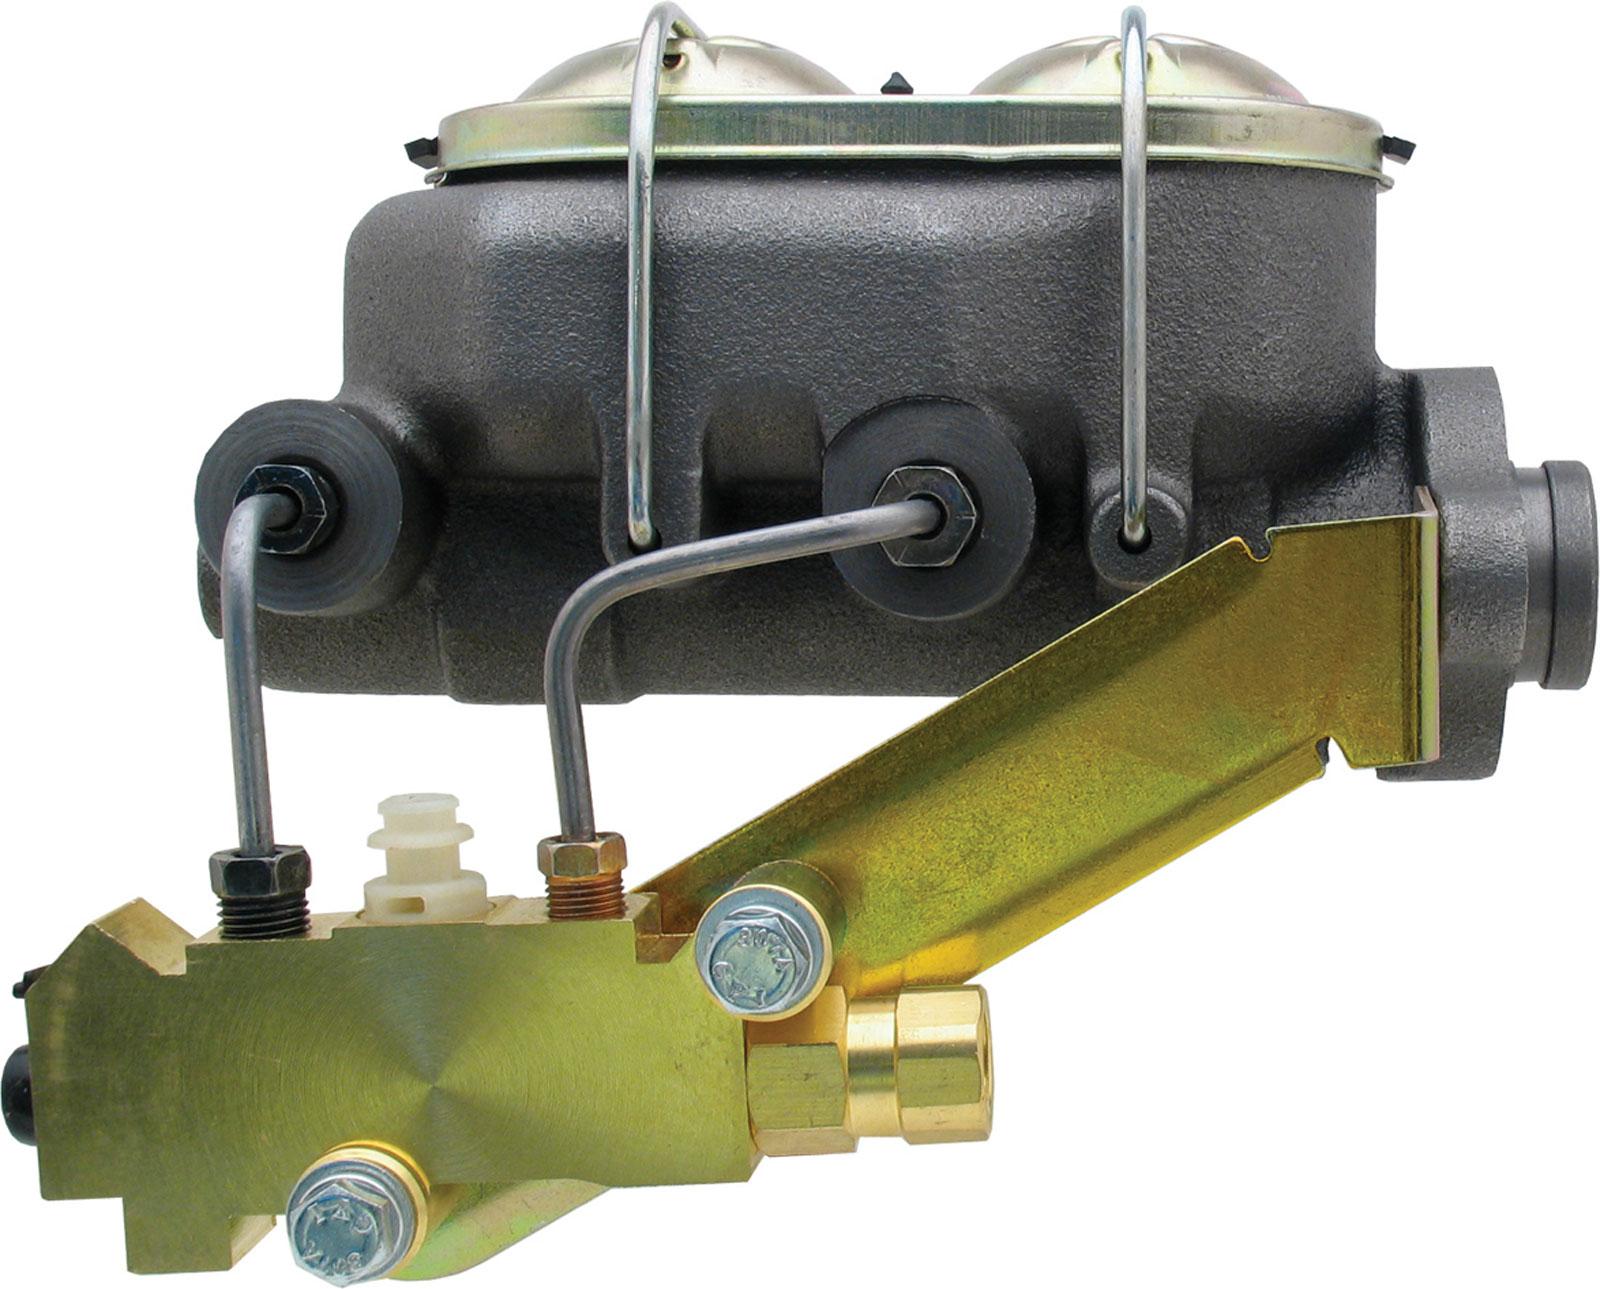 Universal Cast Iron Master Cylinder Kit W/ Left Mount Disc/ Drum Proportioning Valve